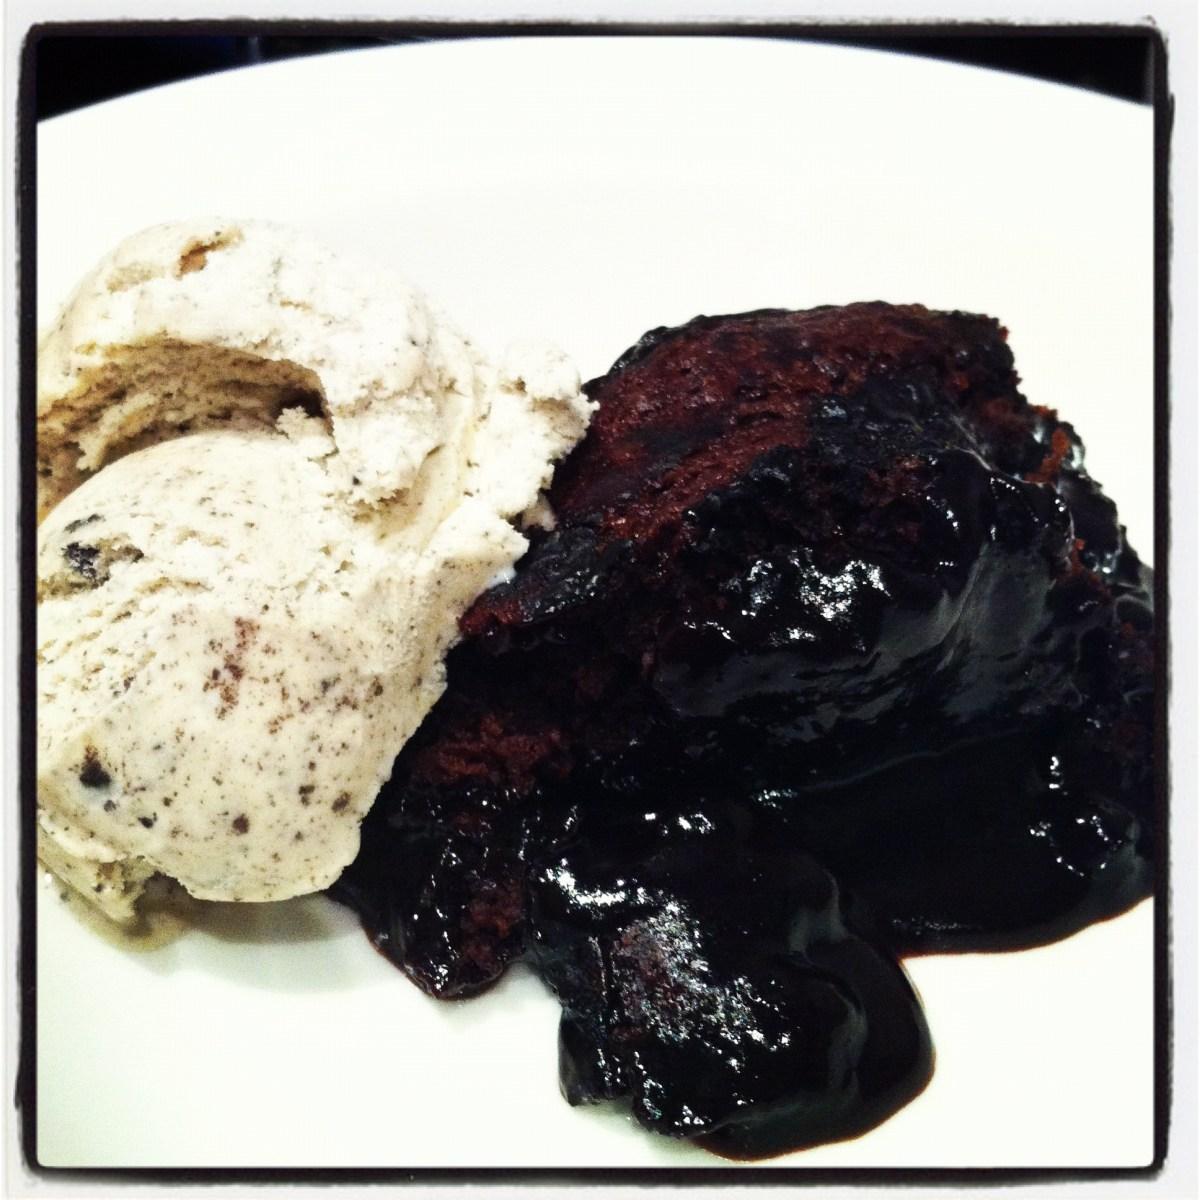 Chocolate self-saucing pudding (aka chocolate sludge)